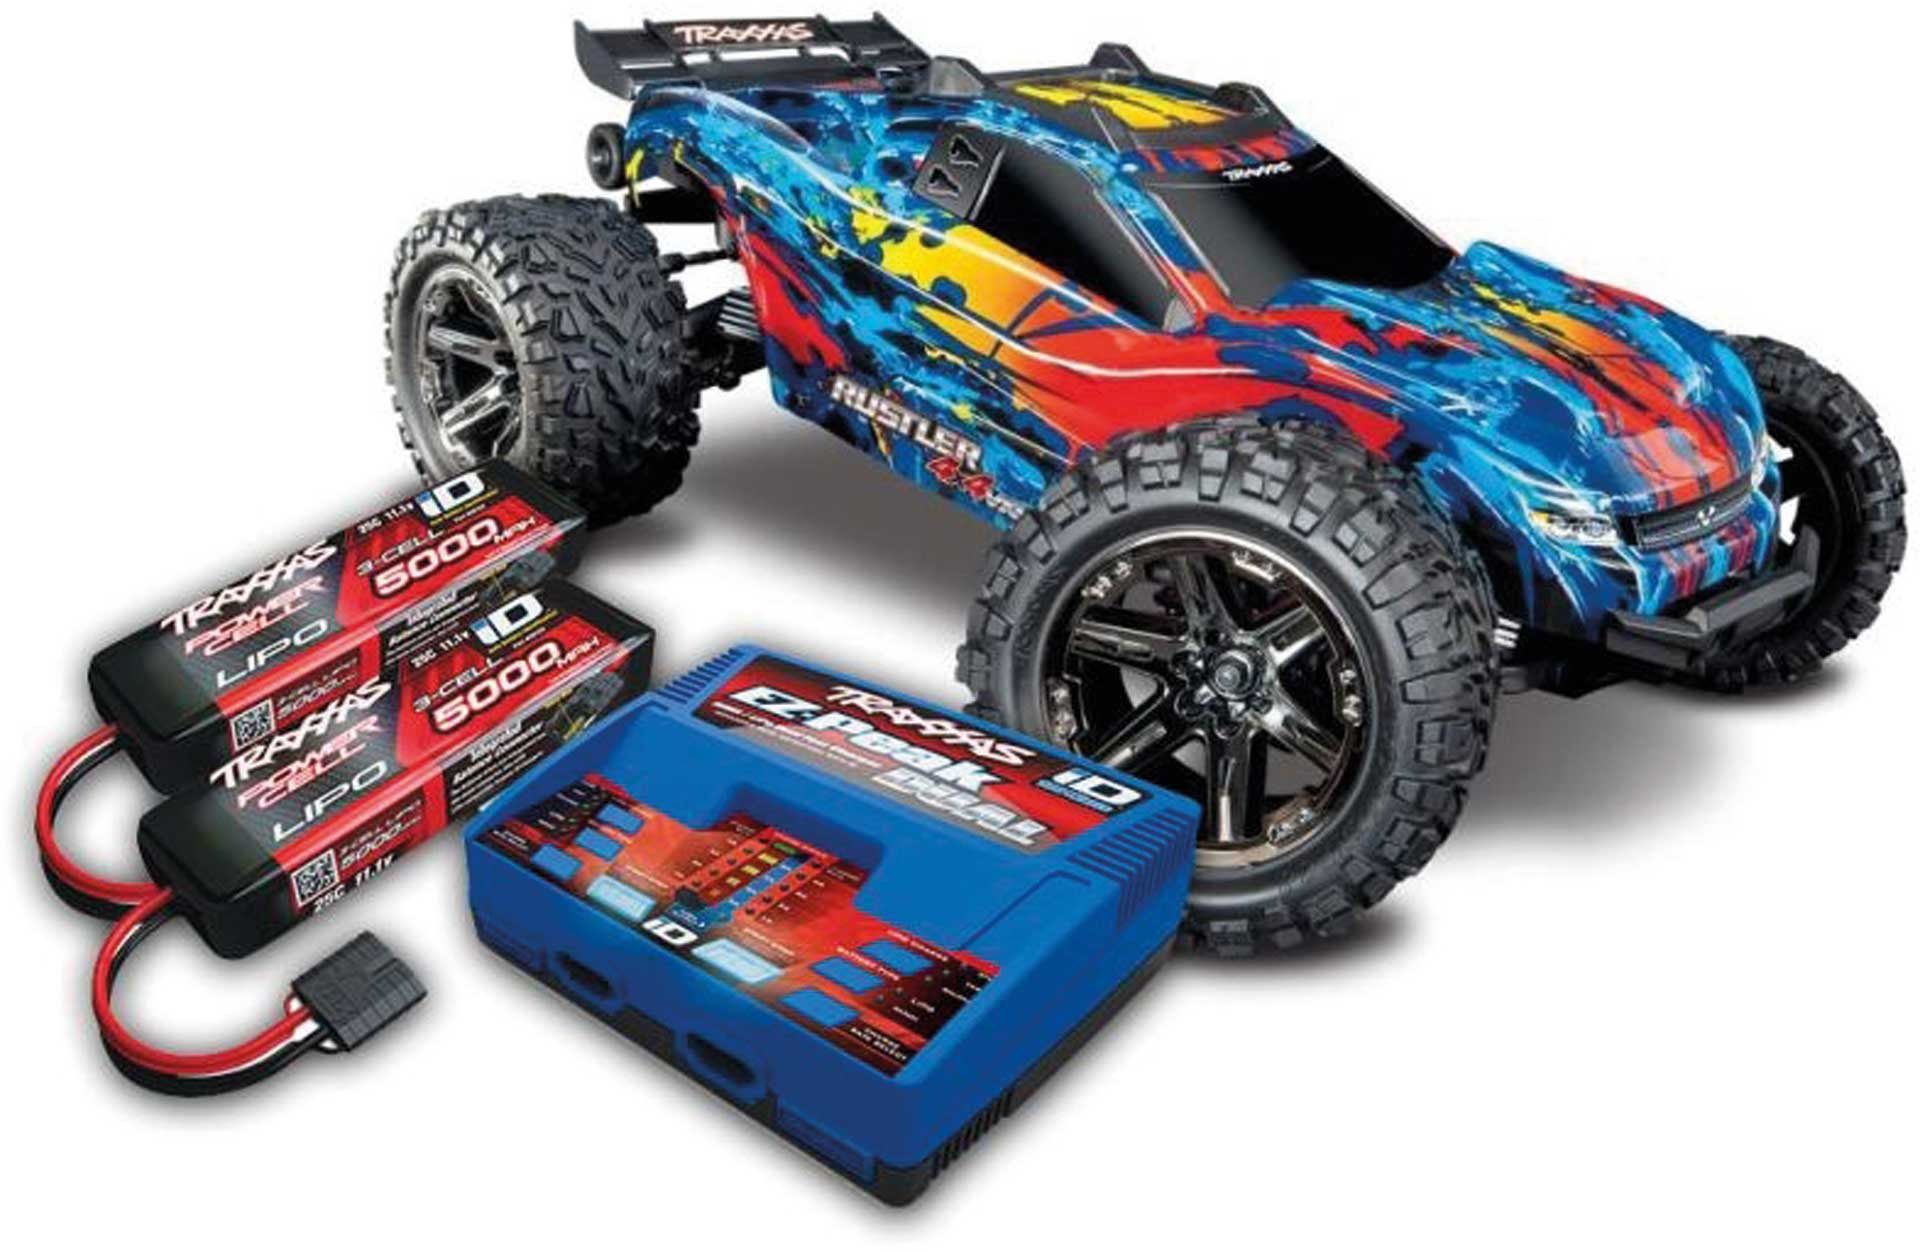 TRAXXAS RUSTLER 4X4 VXL BRUSHLESS RT/GE RTR MIT AKKU/LADER-SET *AKTION* 1/10 4WD STADIUM TRUCK (TRX67076-4 + TRX2990GX)